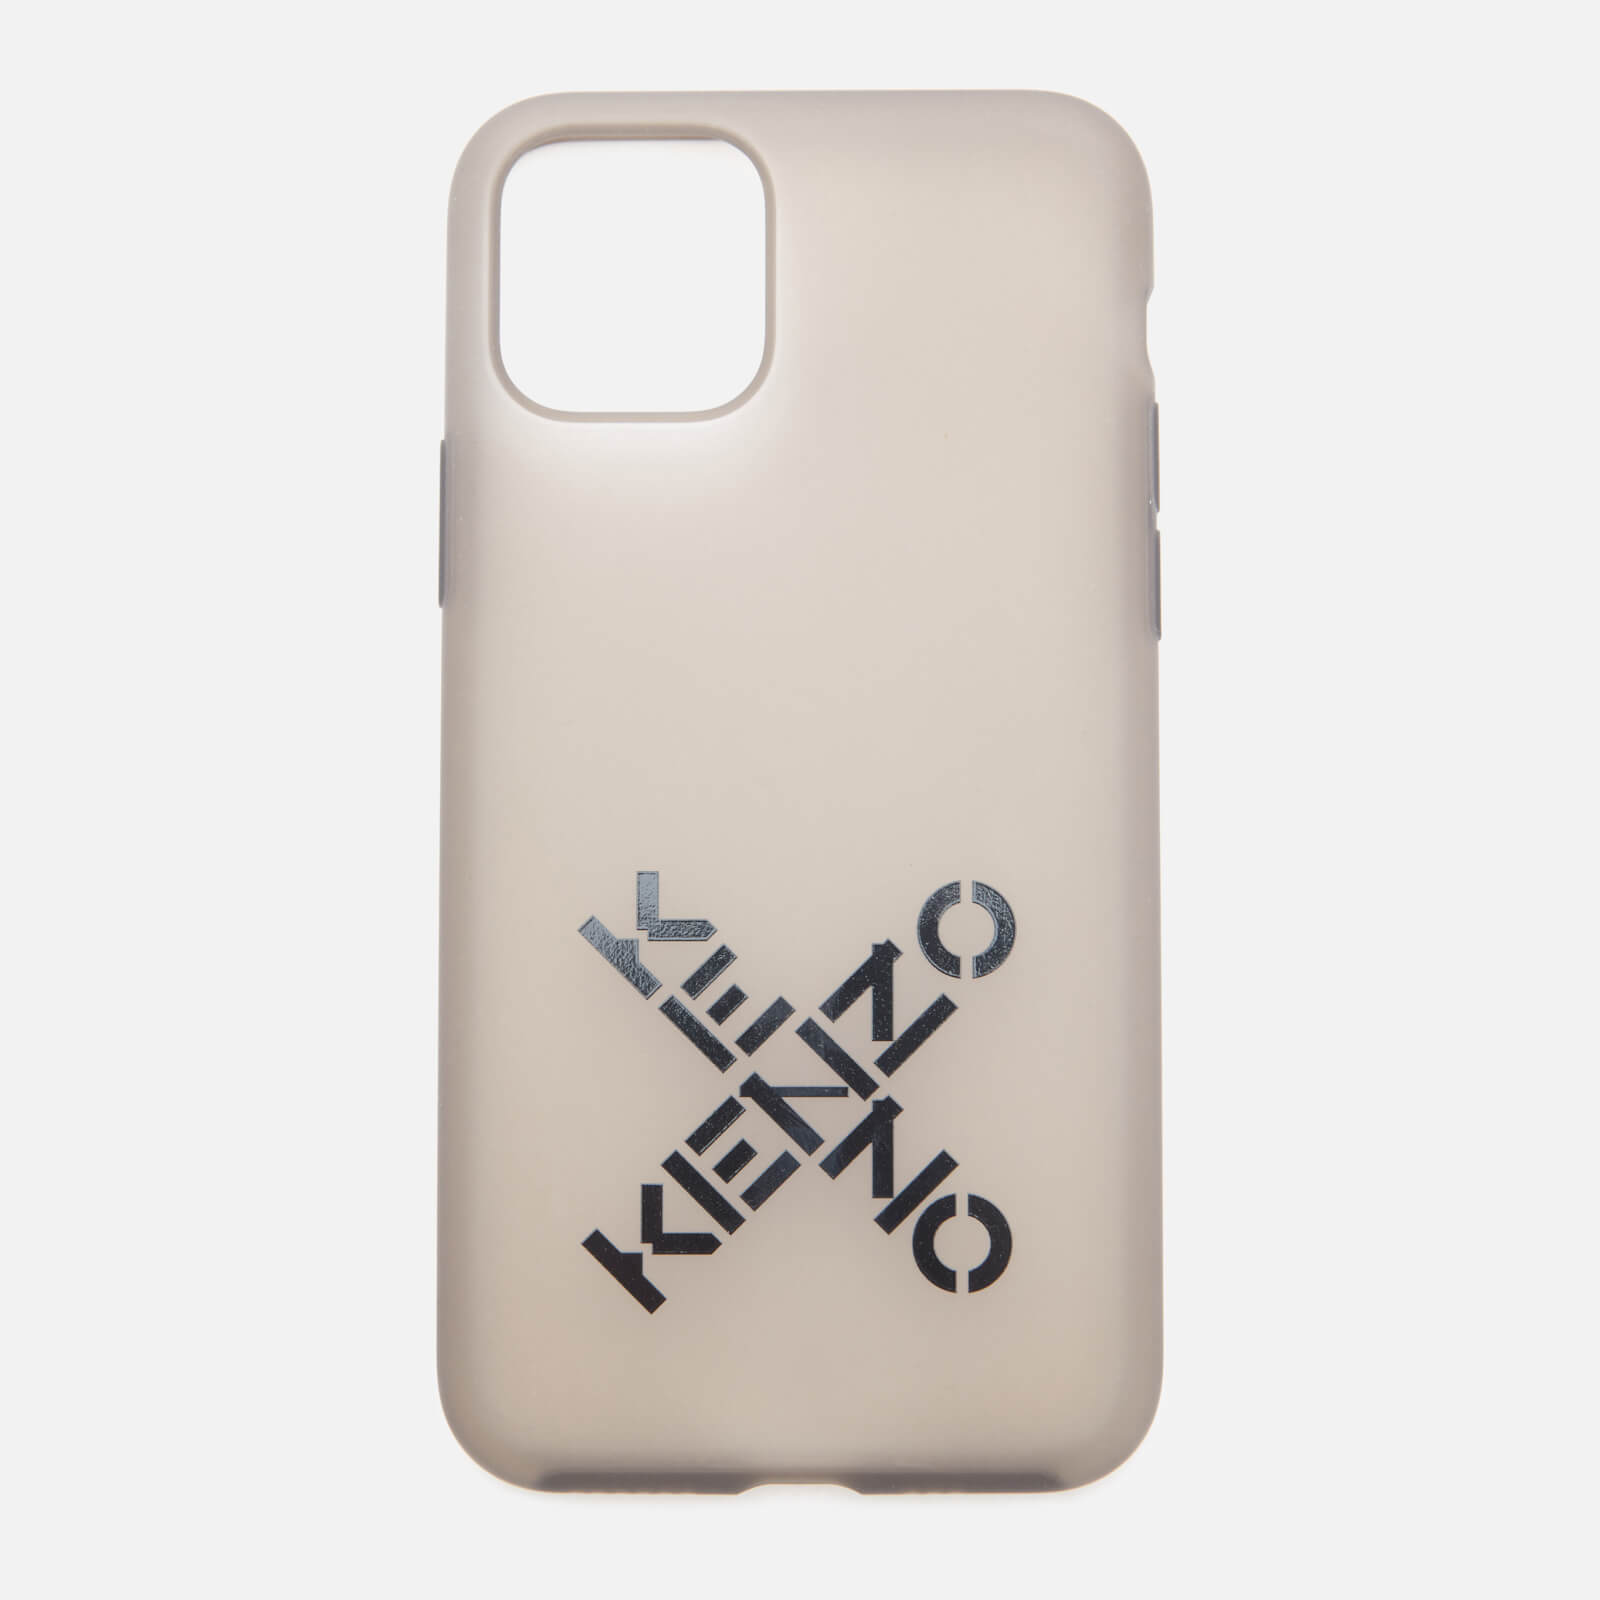 KENZO iPhone 11 Pro Sport Silicone Phone Case - Black